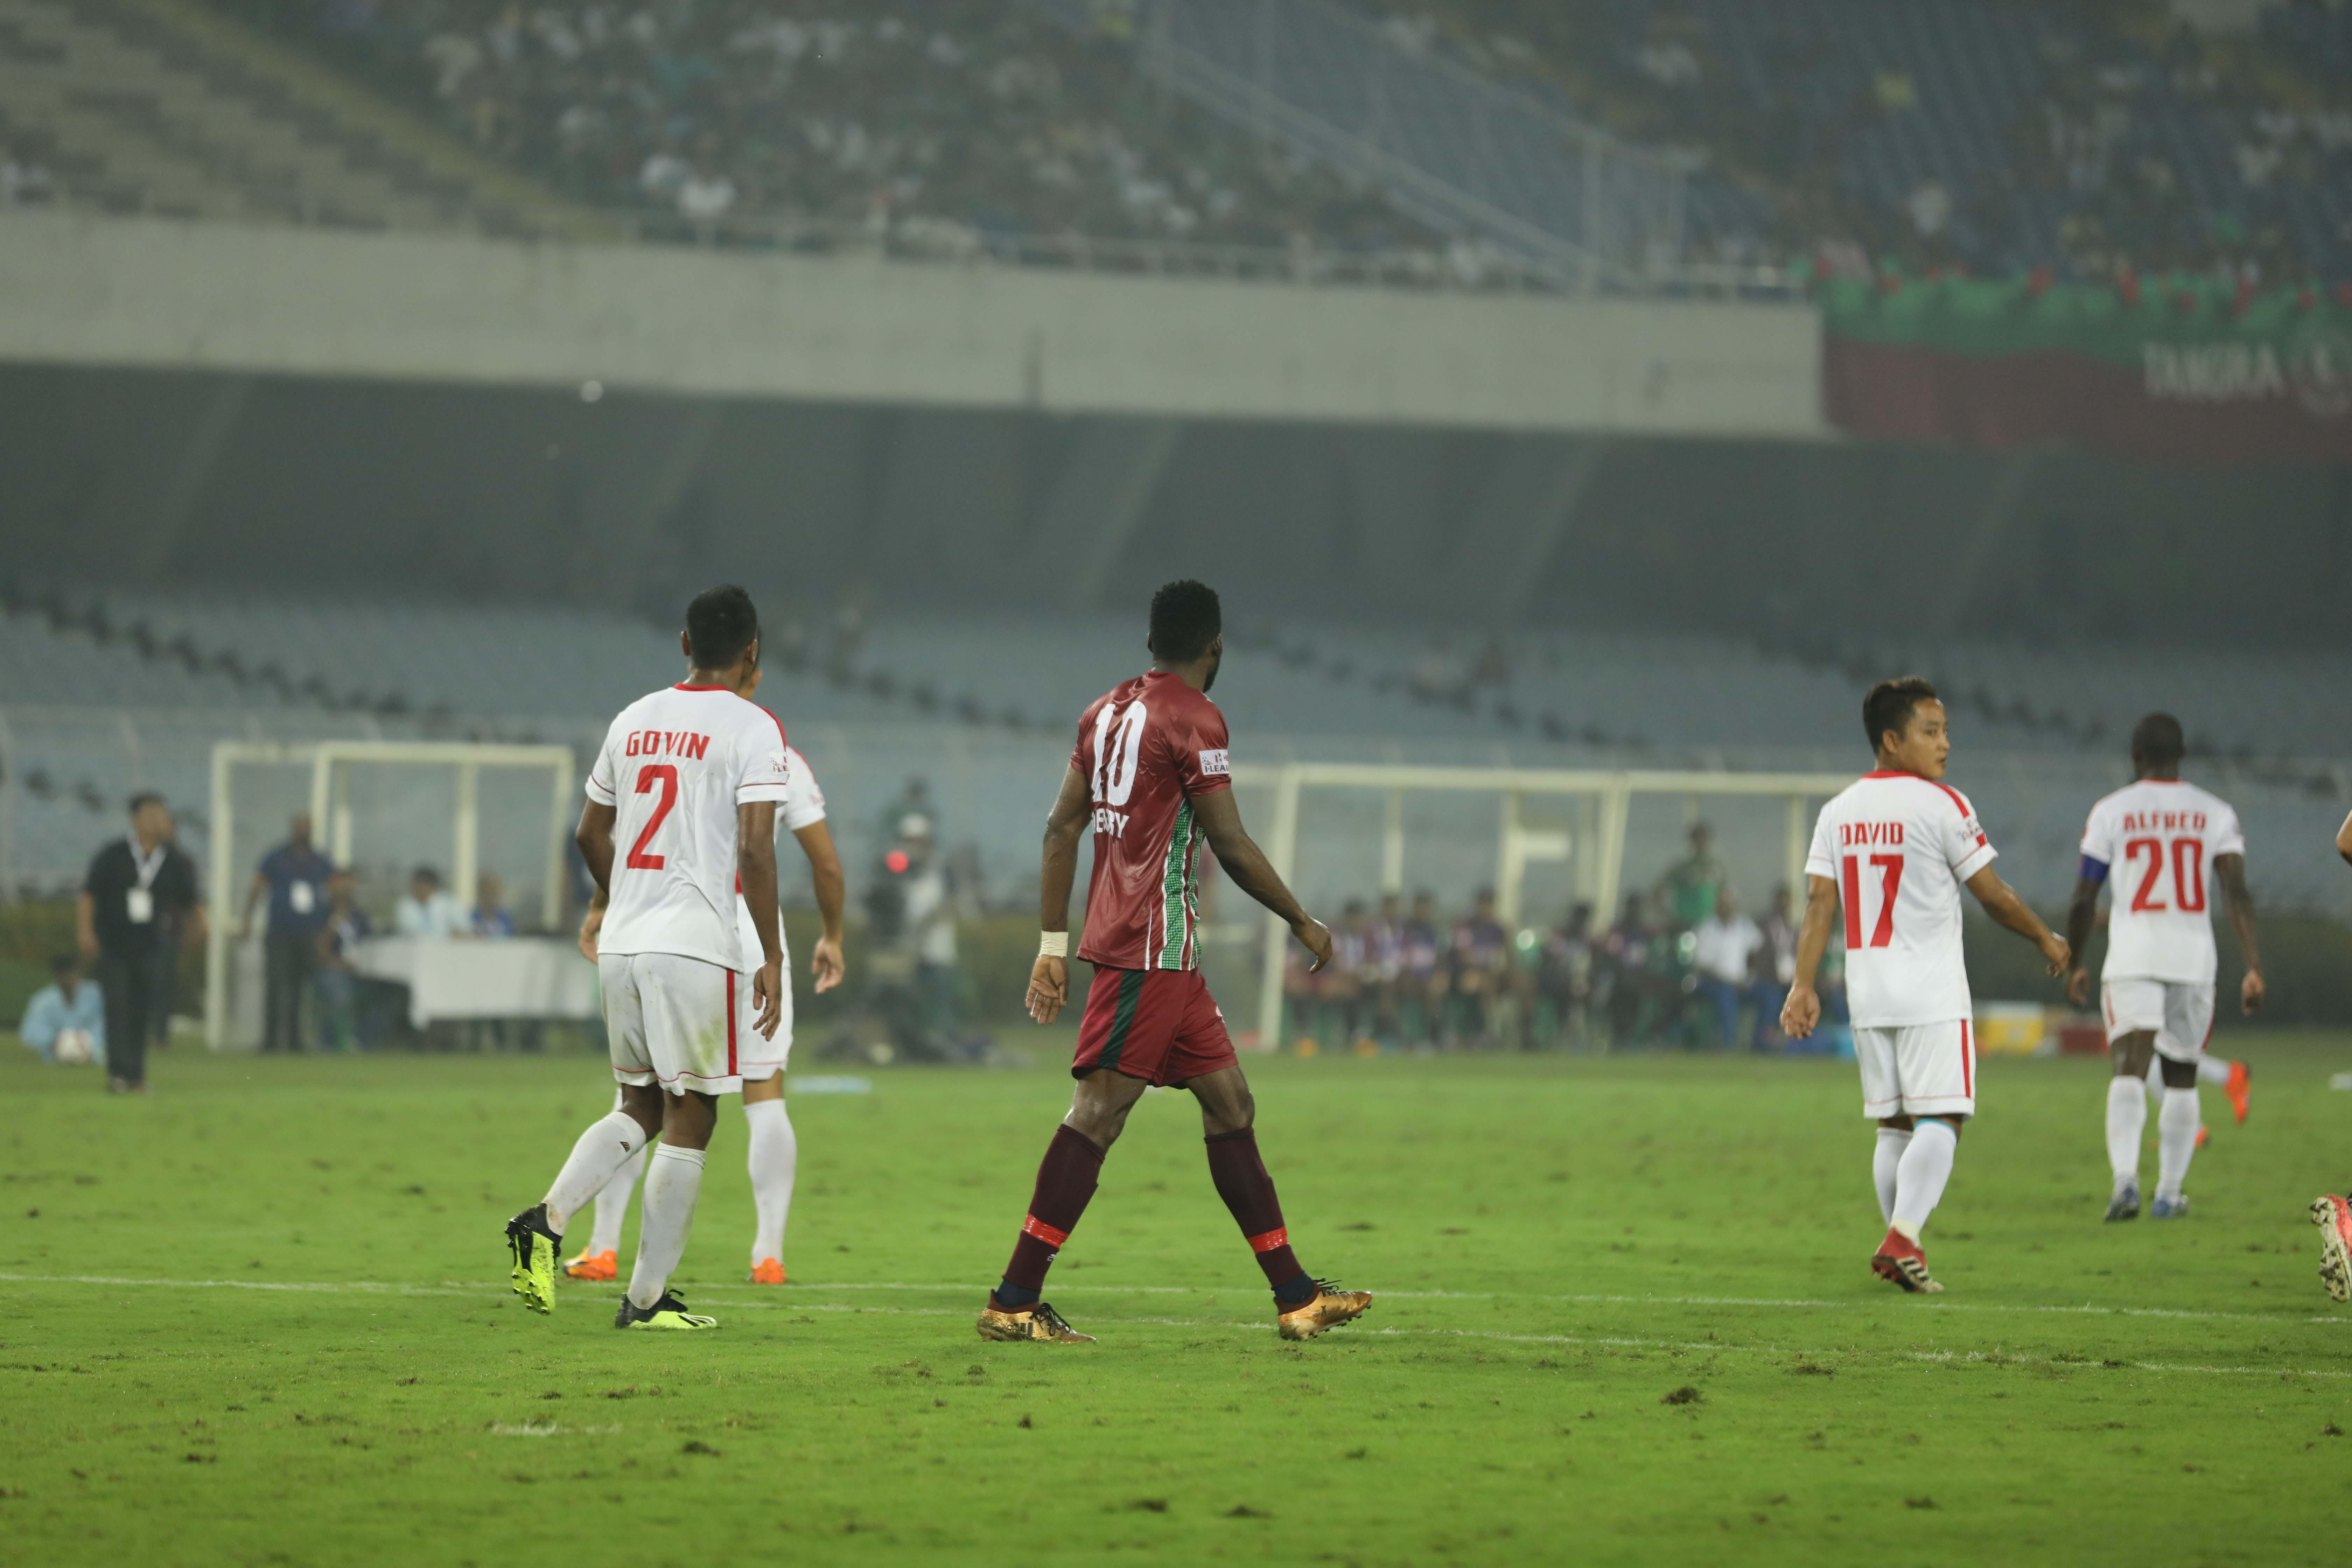 Mohun Bagan Aizawl FC I-League 2018-19